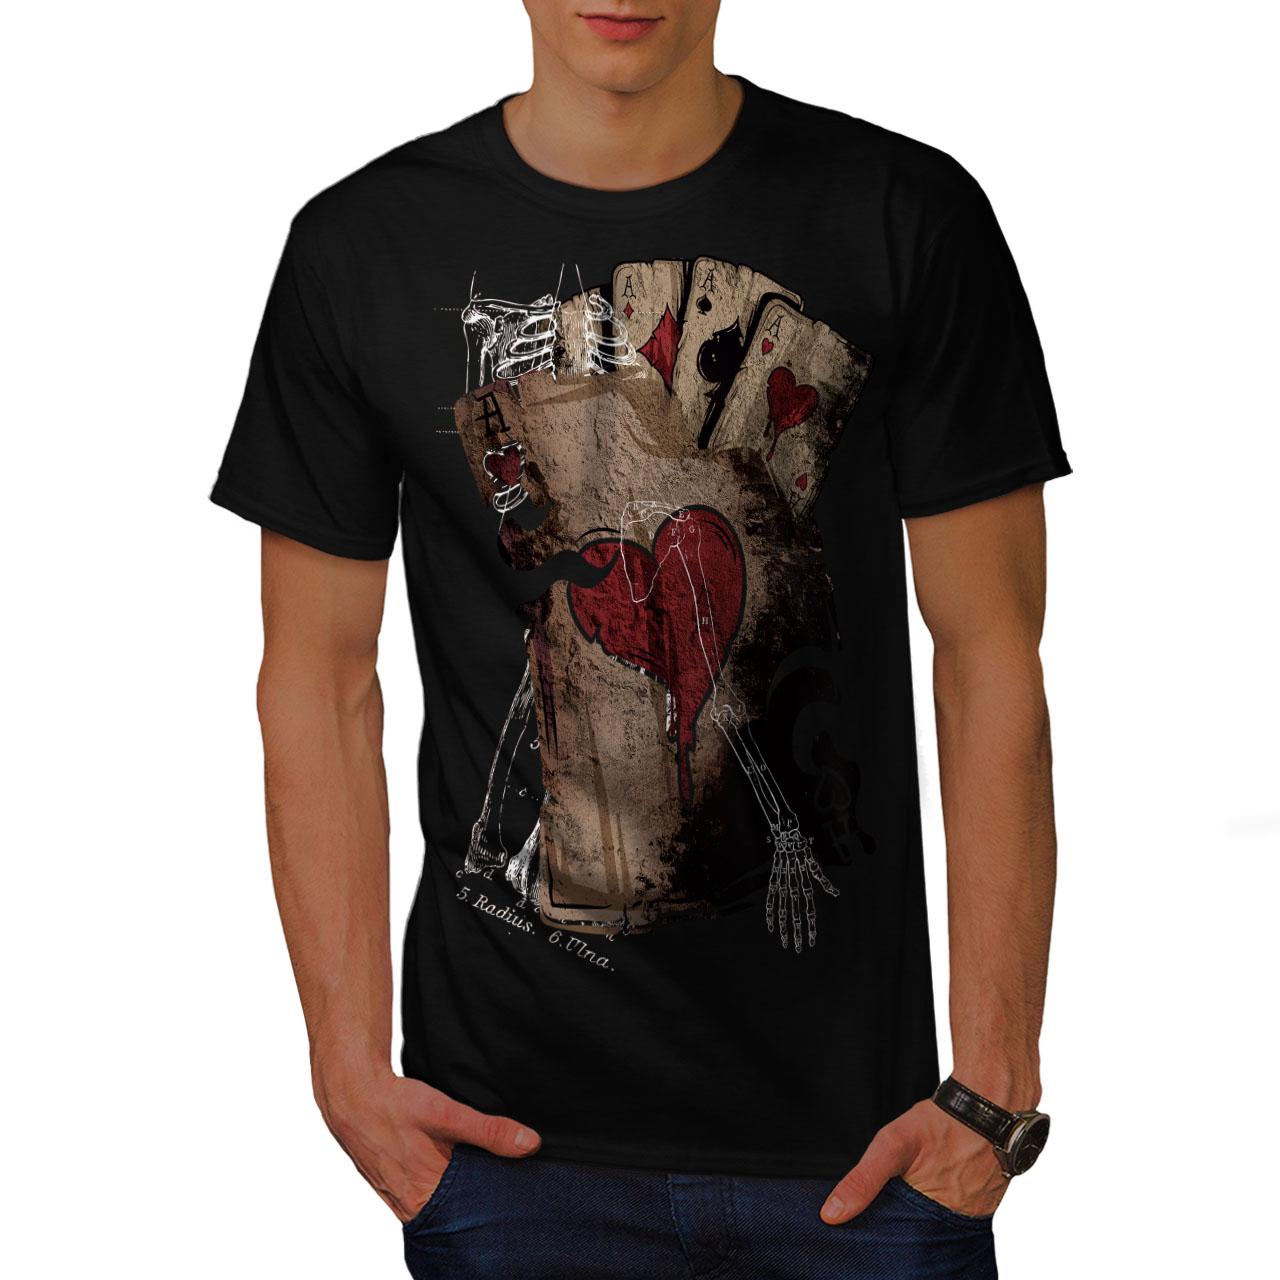 Wellcoda-Poker-Gamble-Squelette-T-shirt-homme-effrayant-conception-graphique-imprime-Tee